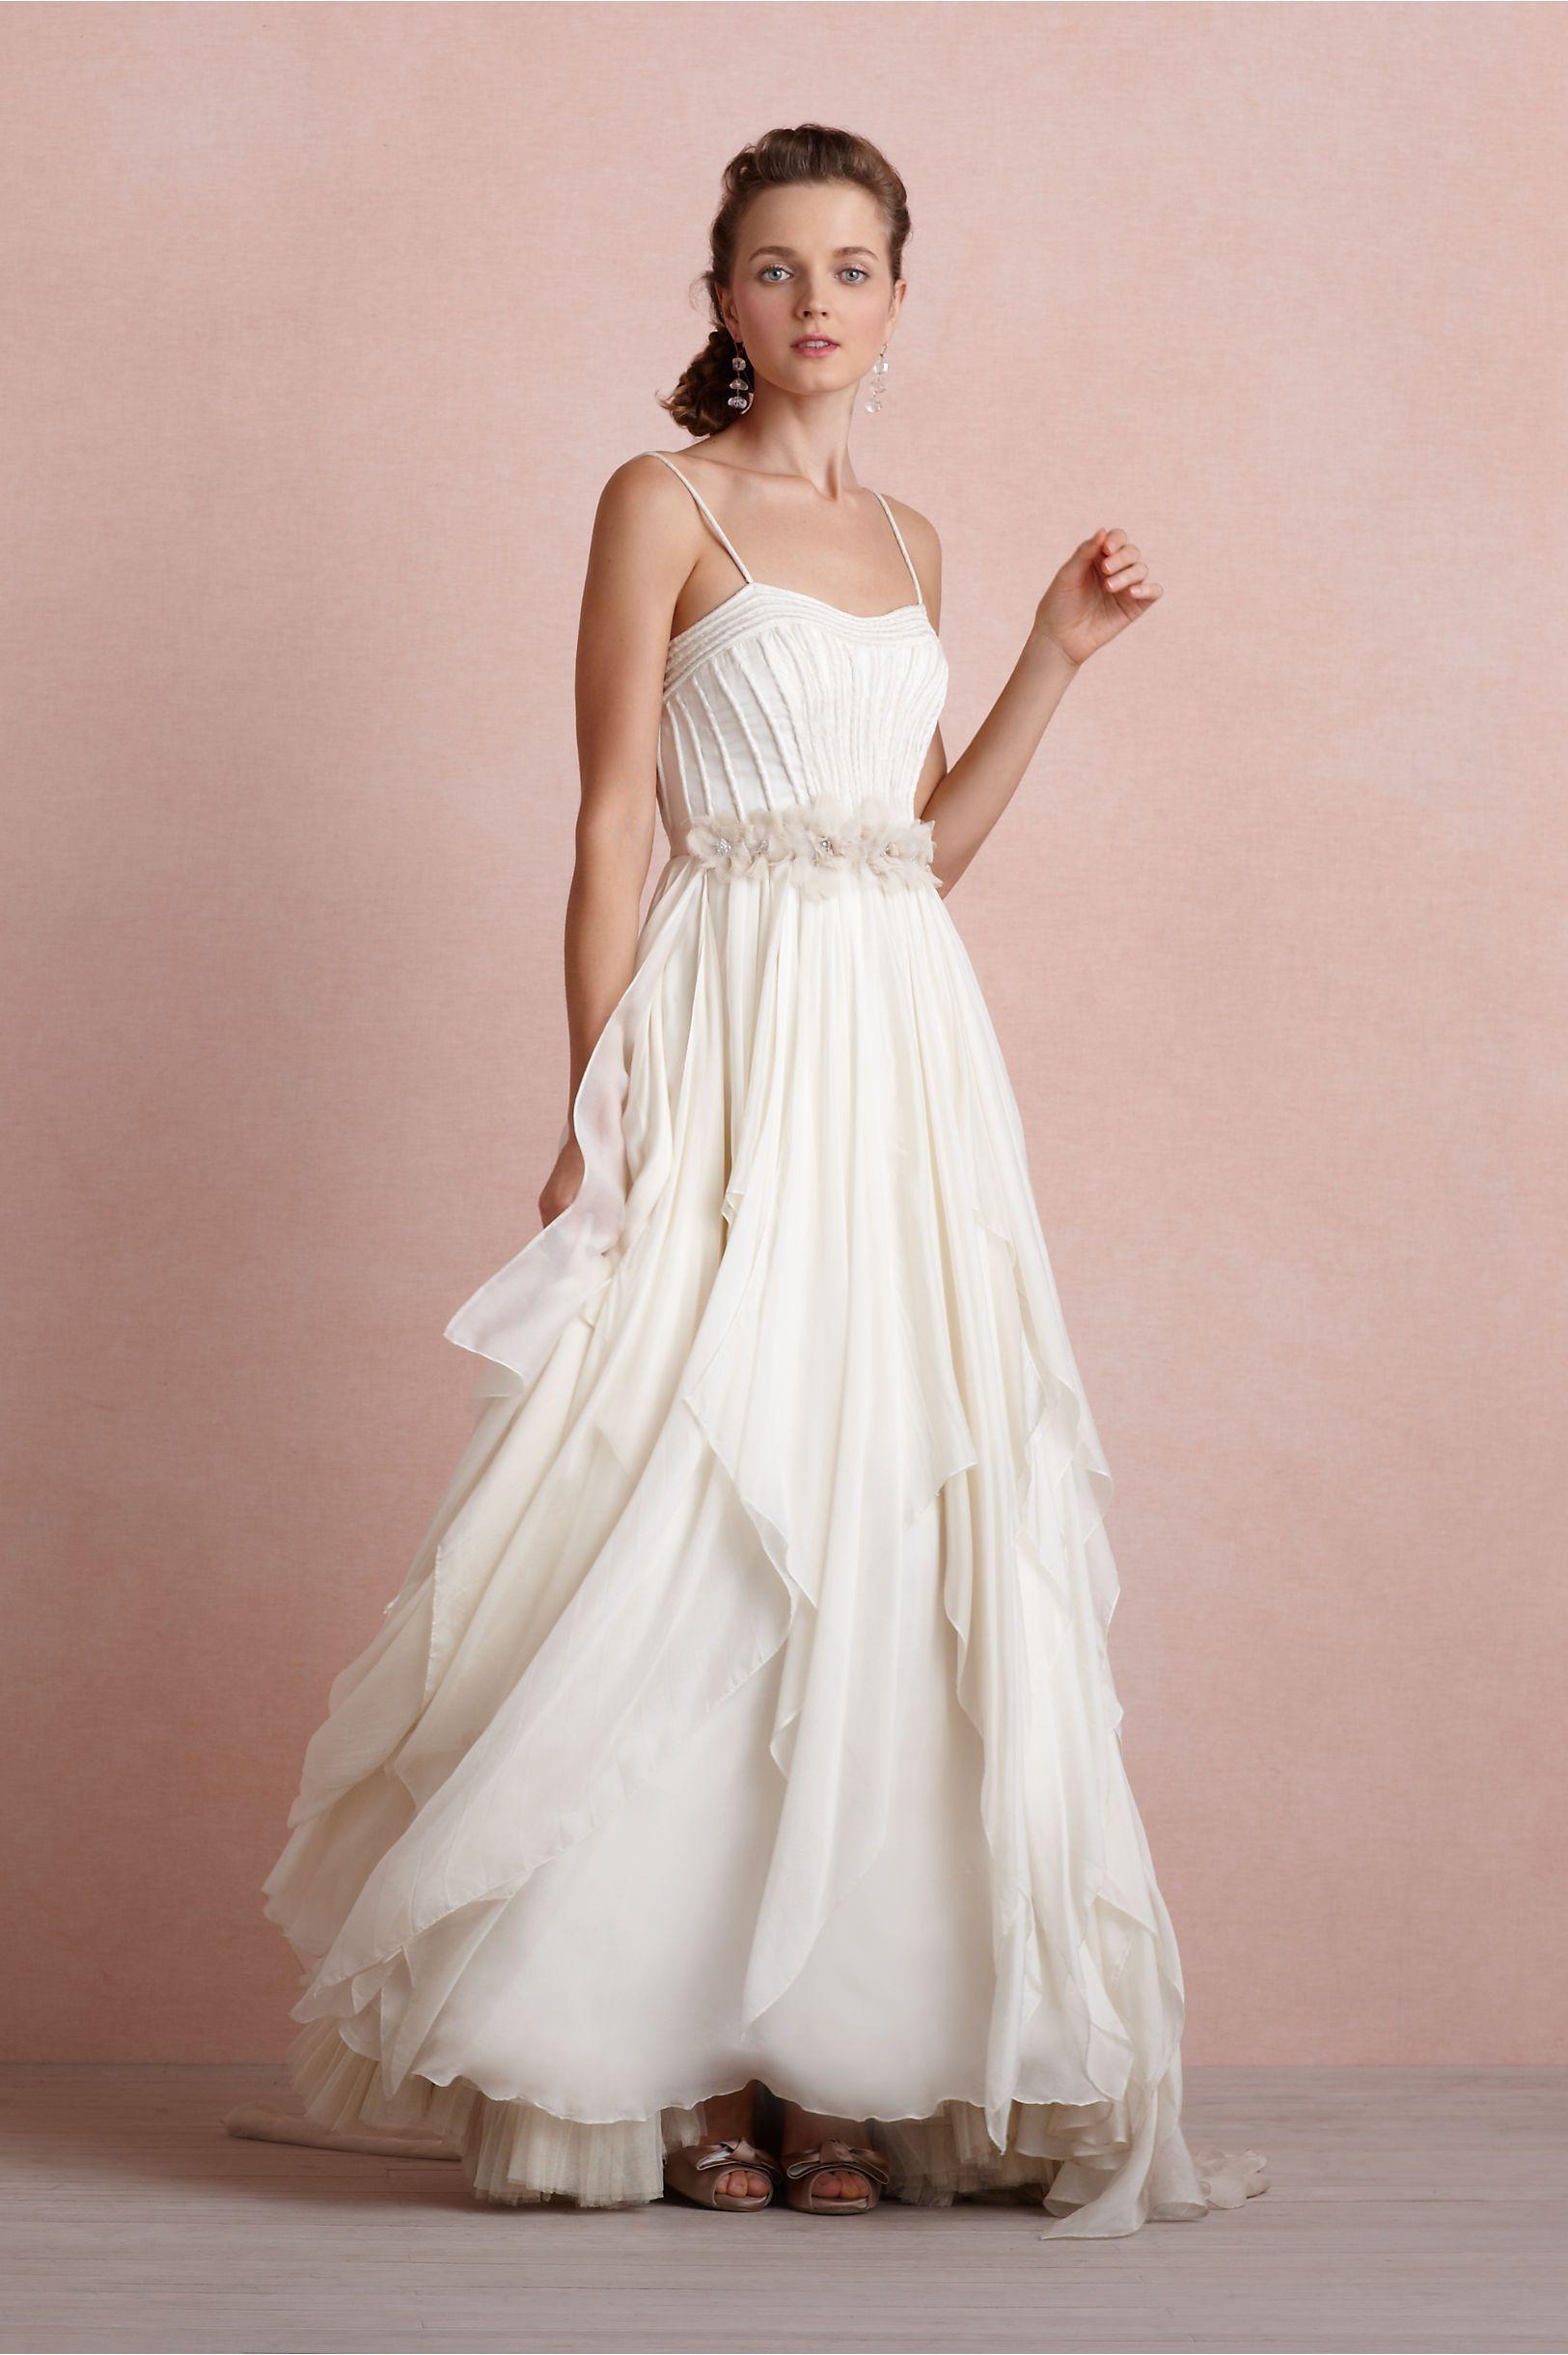 goddess gowns dresses - Google Search | My Closet | Pinterest ...